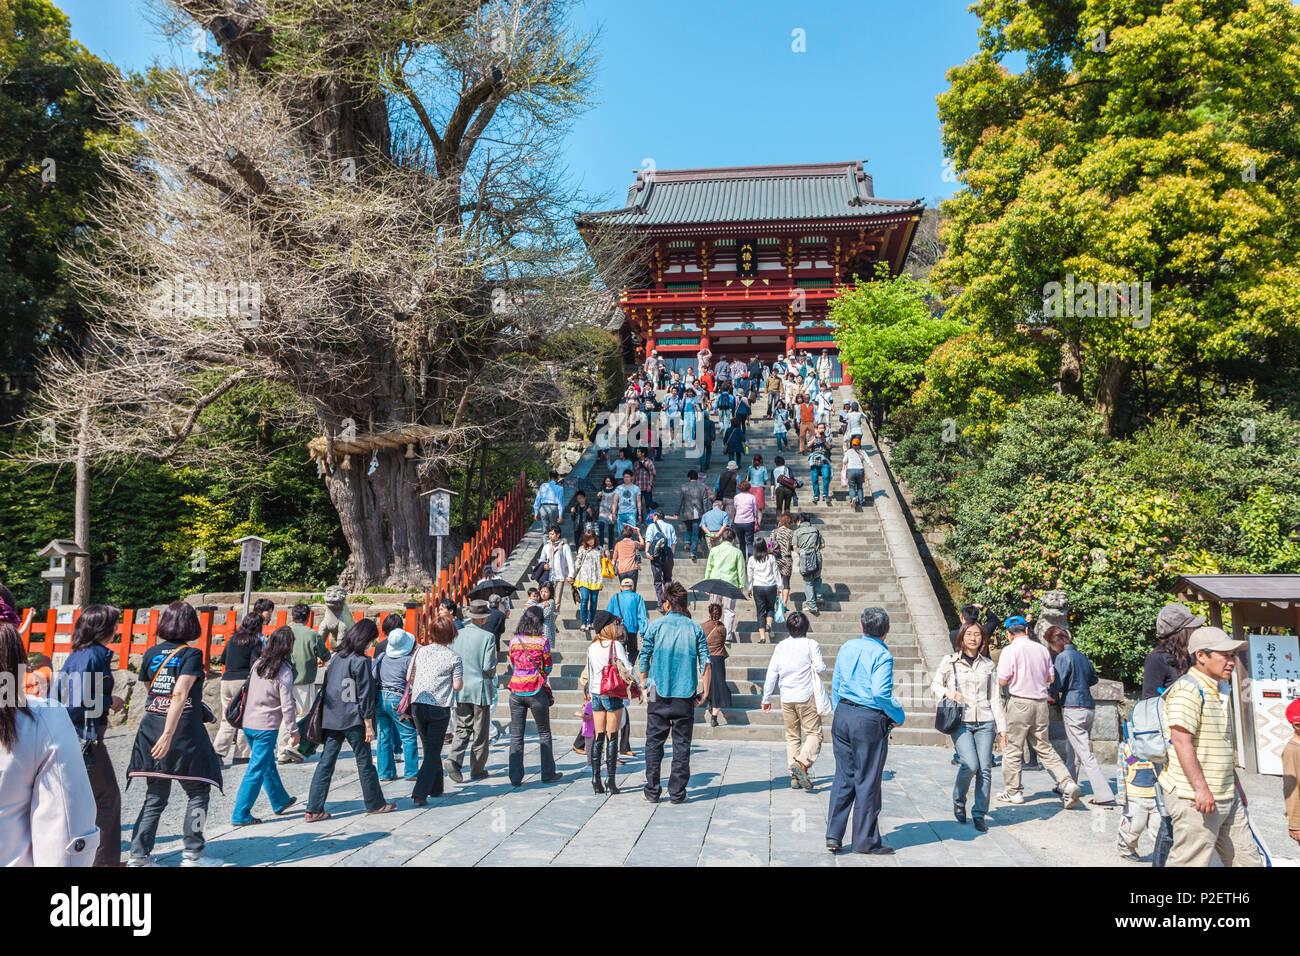 Stairs in front of Hachimangu Shrine in Kamakura, Kanagawa Prefecture, Japan - Stock Image